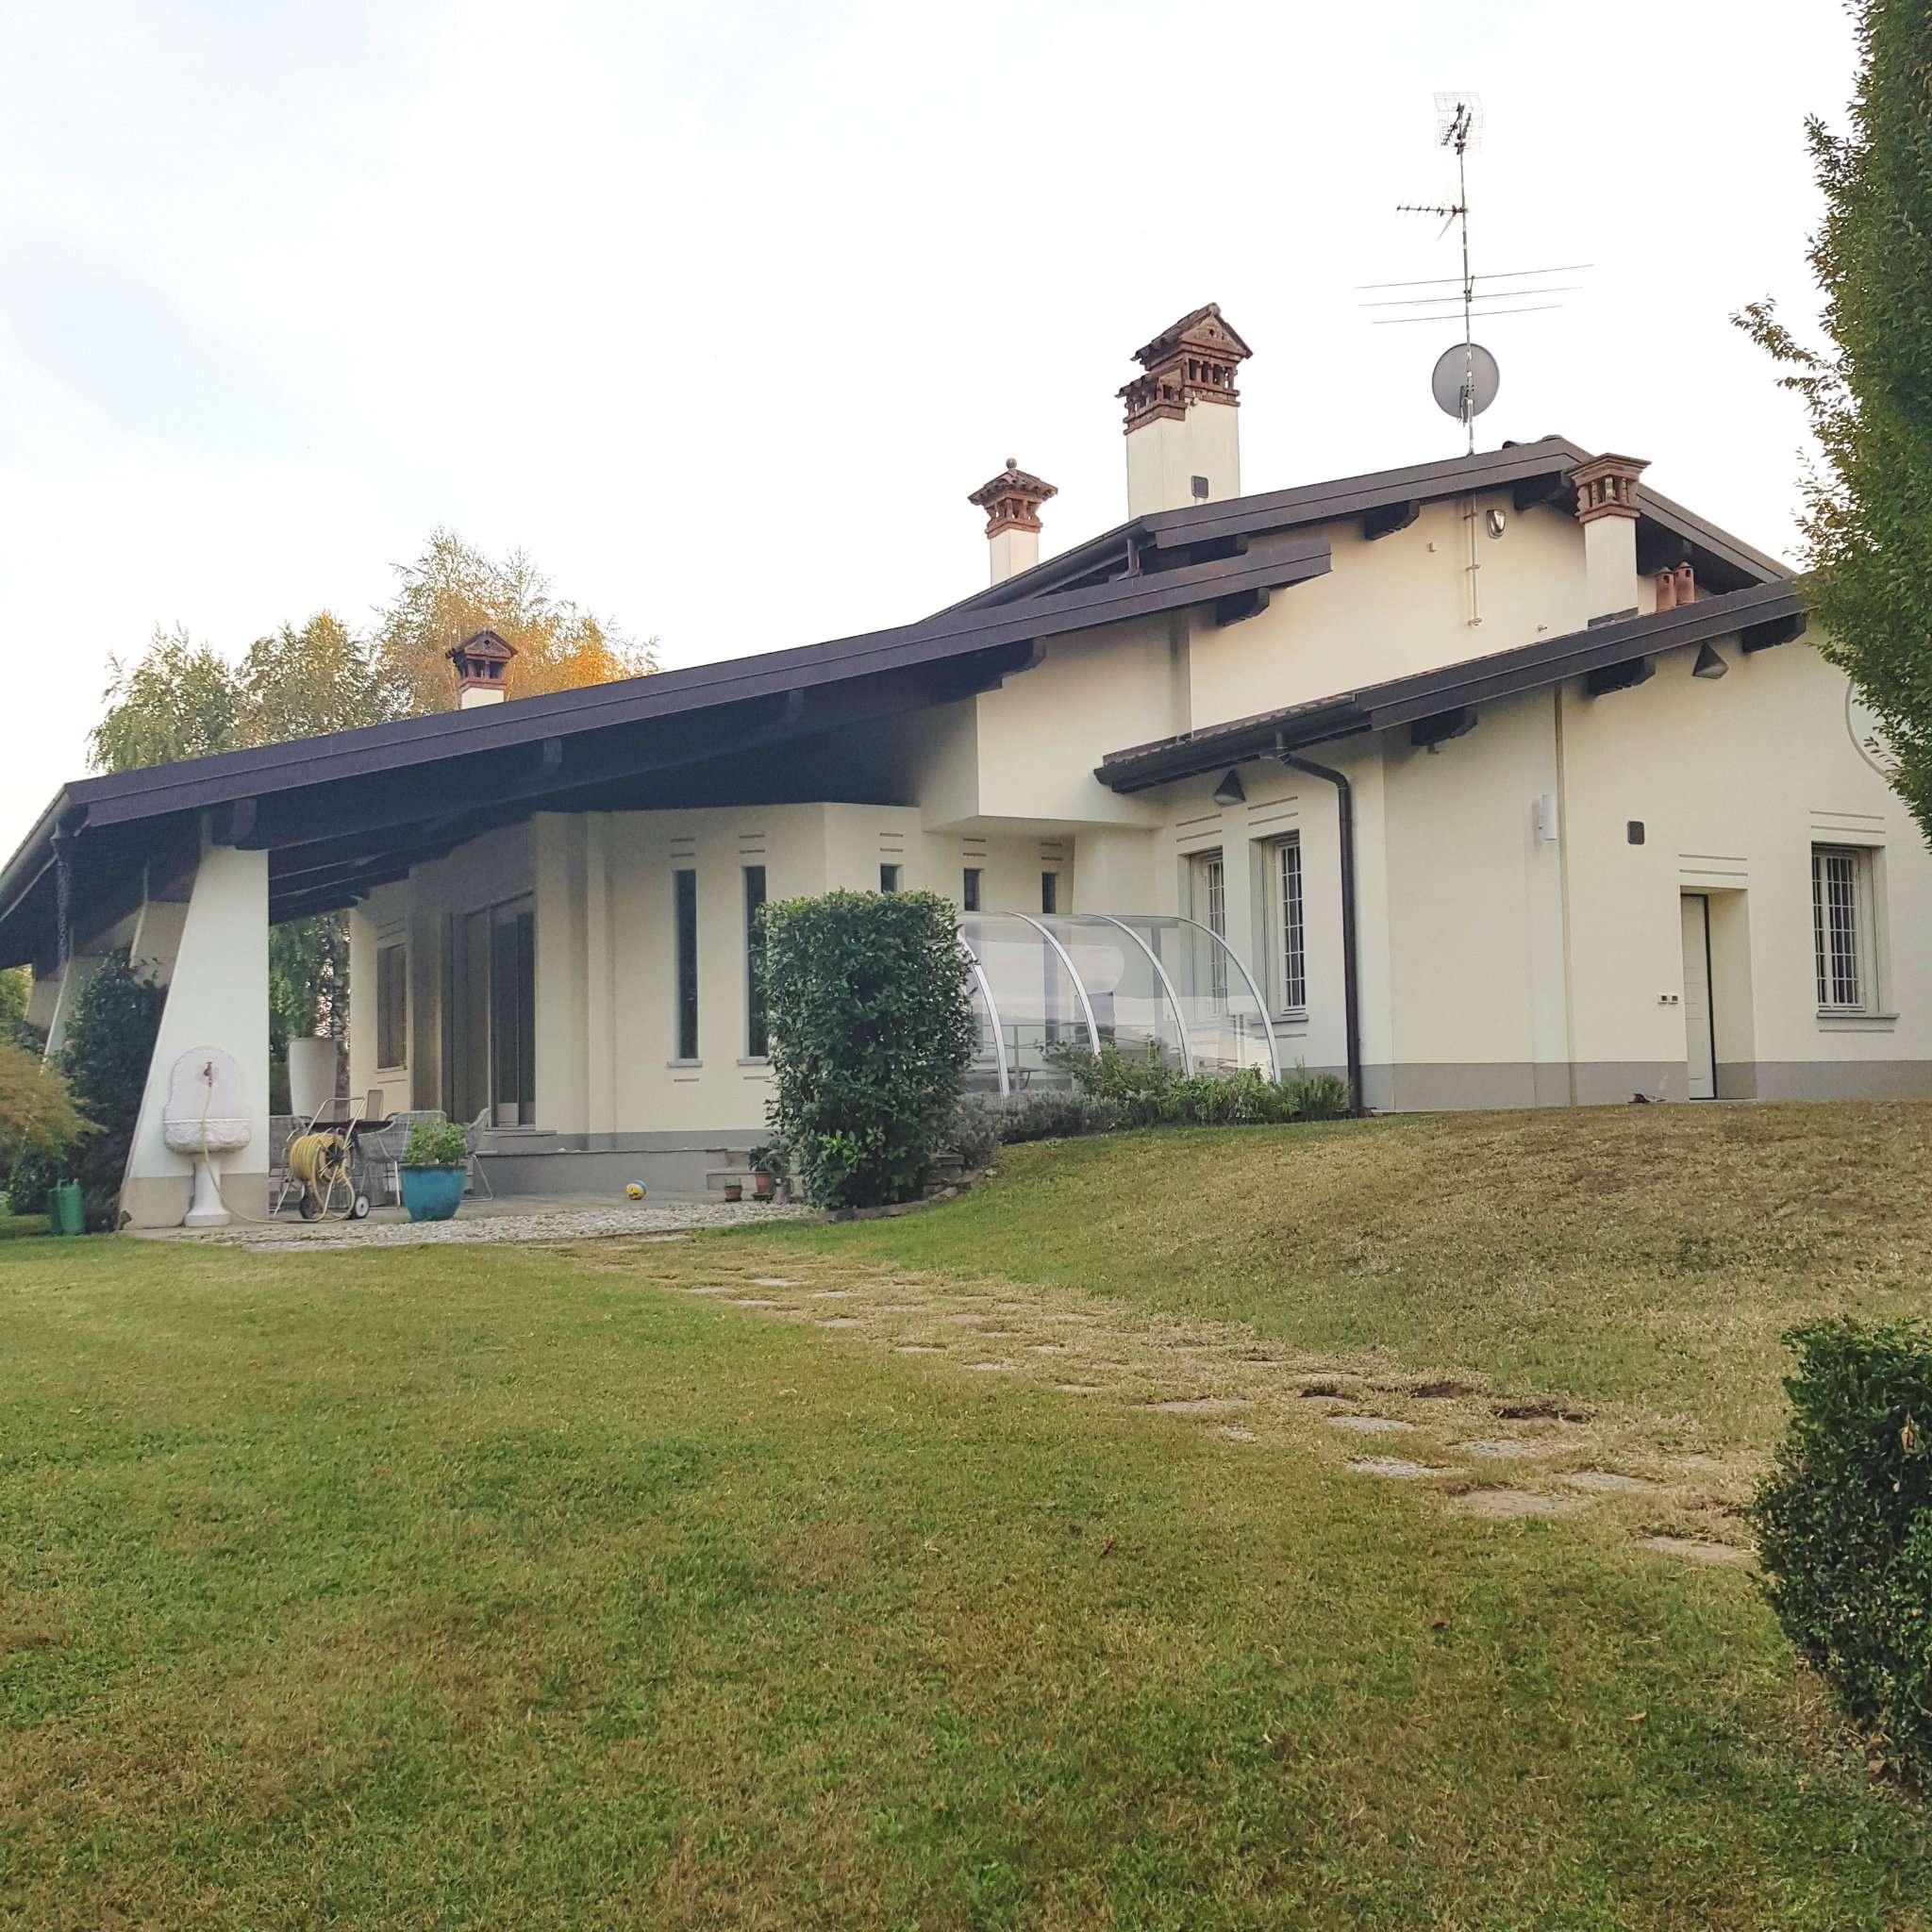 Villa in vendita a Casnate con Bernate, 4 locali, Trattative riservate   CambioCasa.it